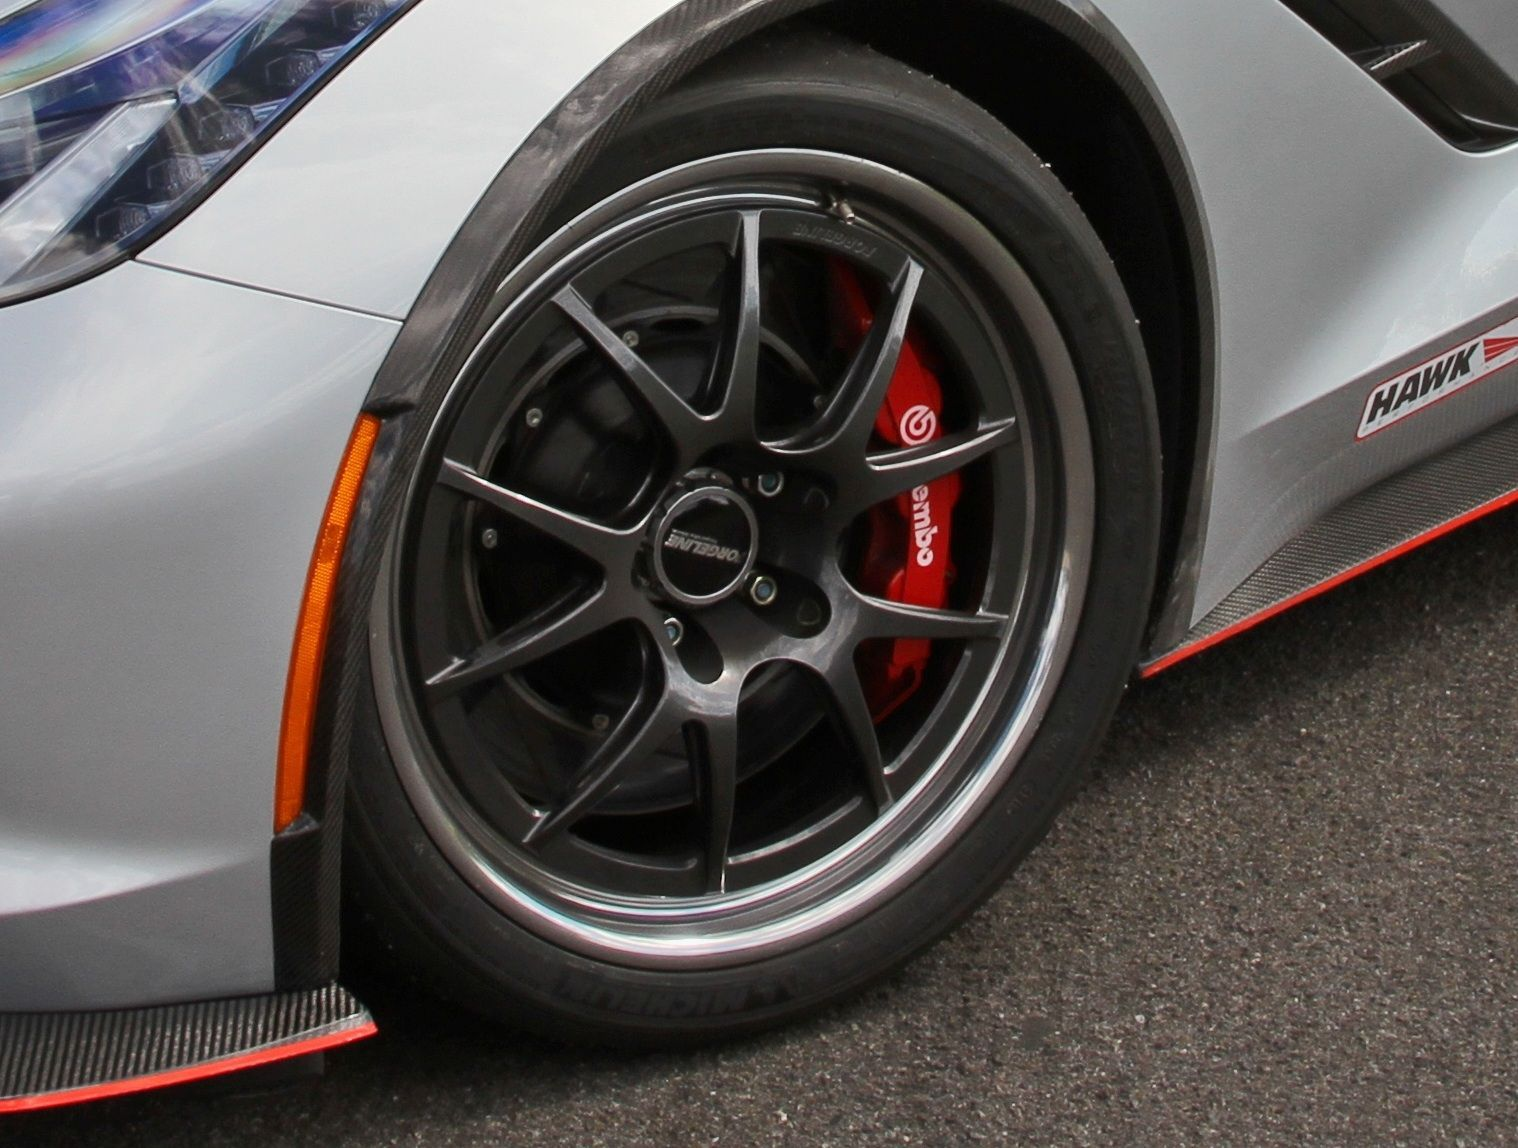 2014 Chevrolet Corvette Stingray | Forgeline GA3R Wheel on the Nowicki Autosport Concept7 C7 Corvette